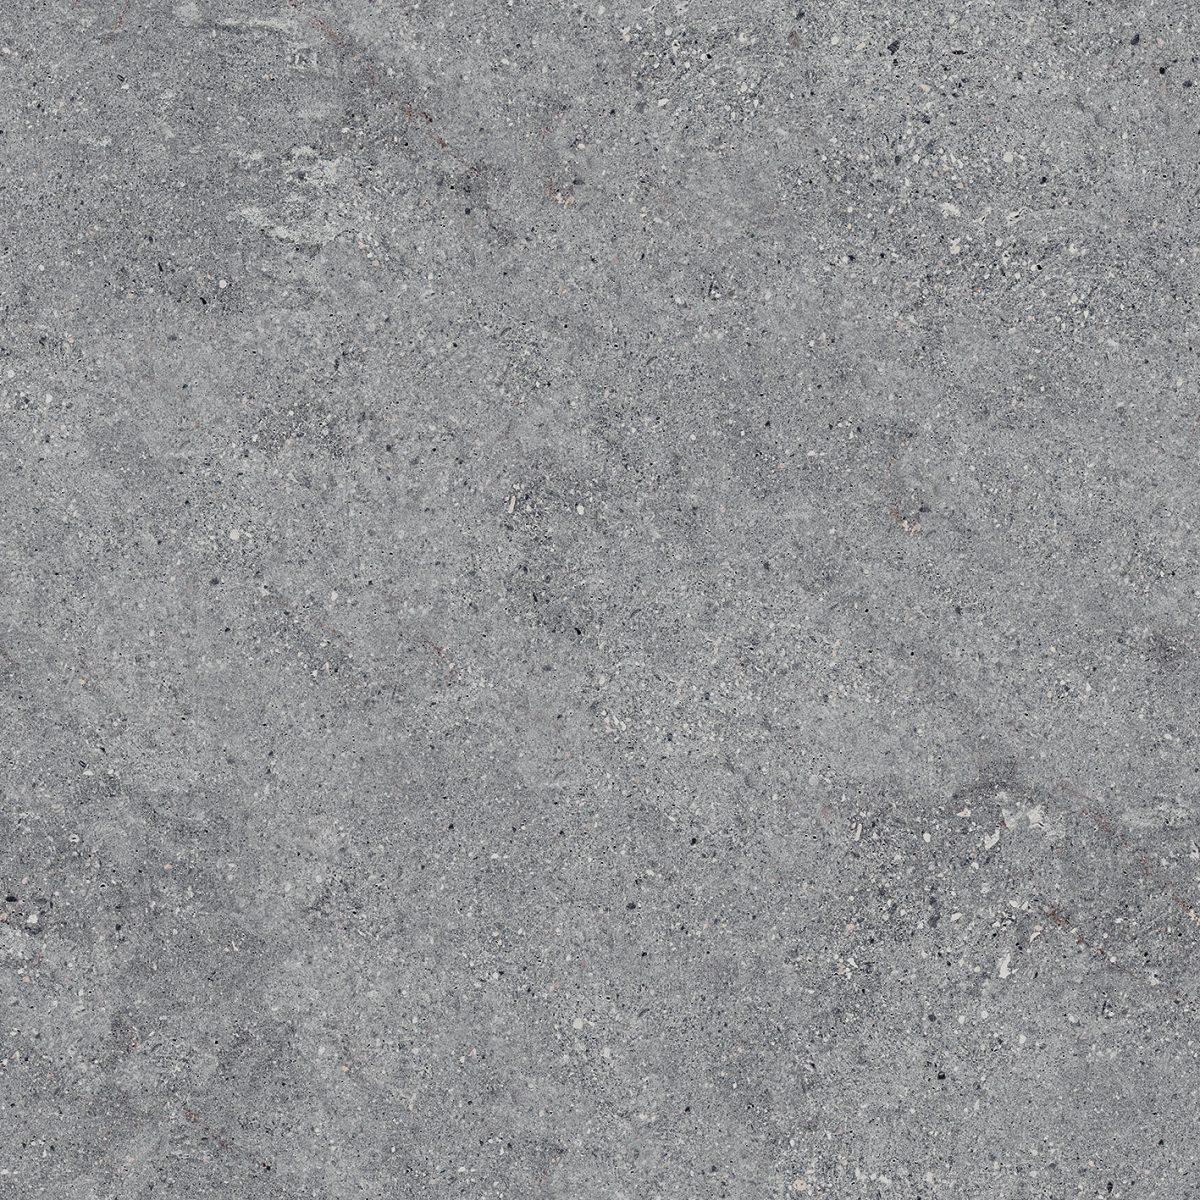 Porcelanosa Prada Grey Tile 120 x 120 cm